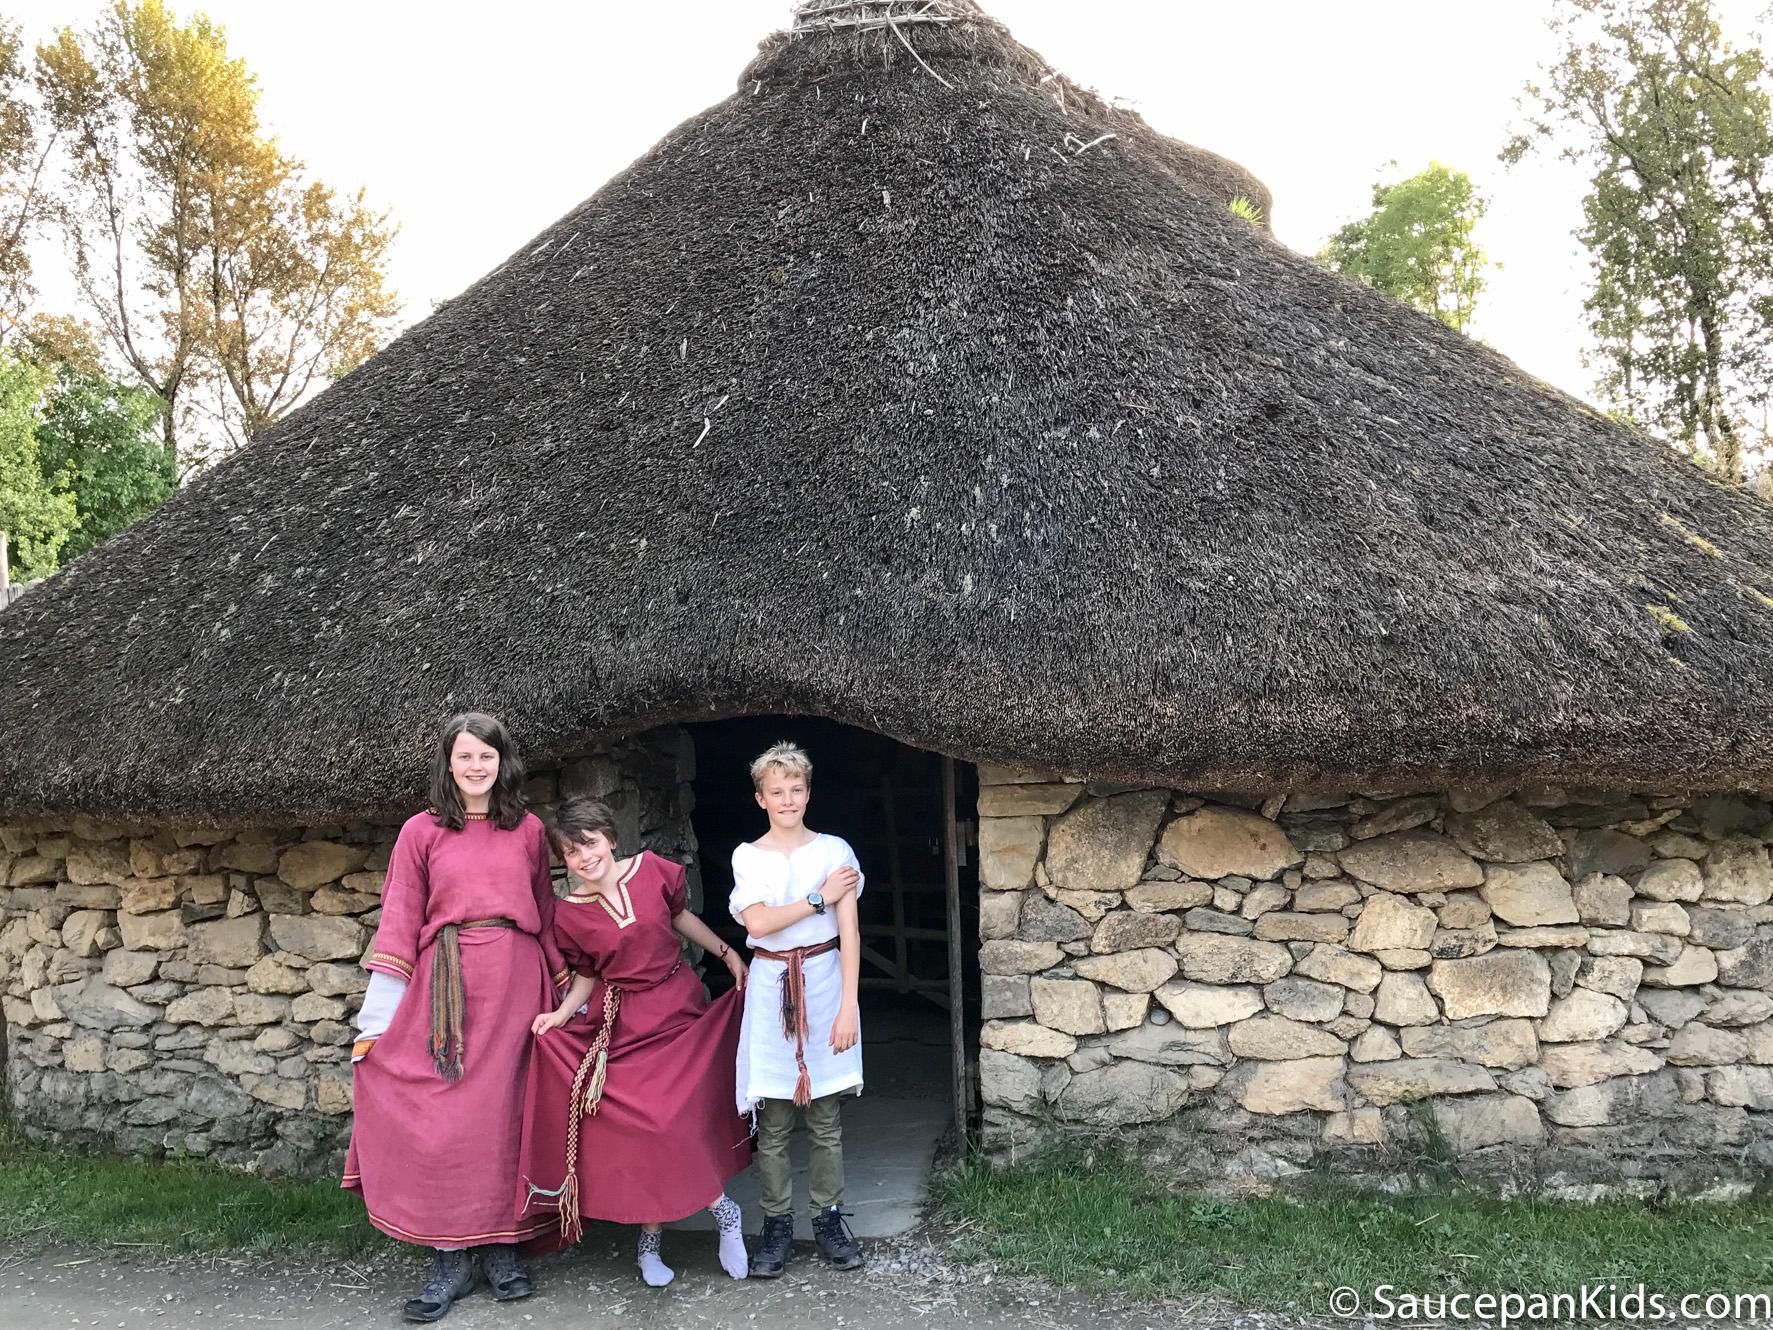 Irish National Heritage Park Ringfort Stayover review - by Saucepan Kids